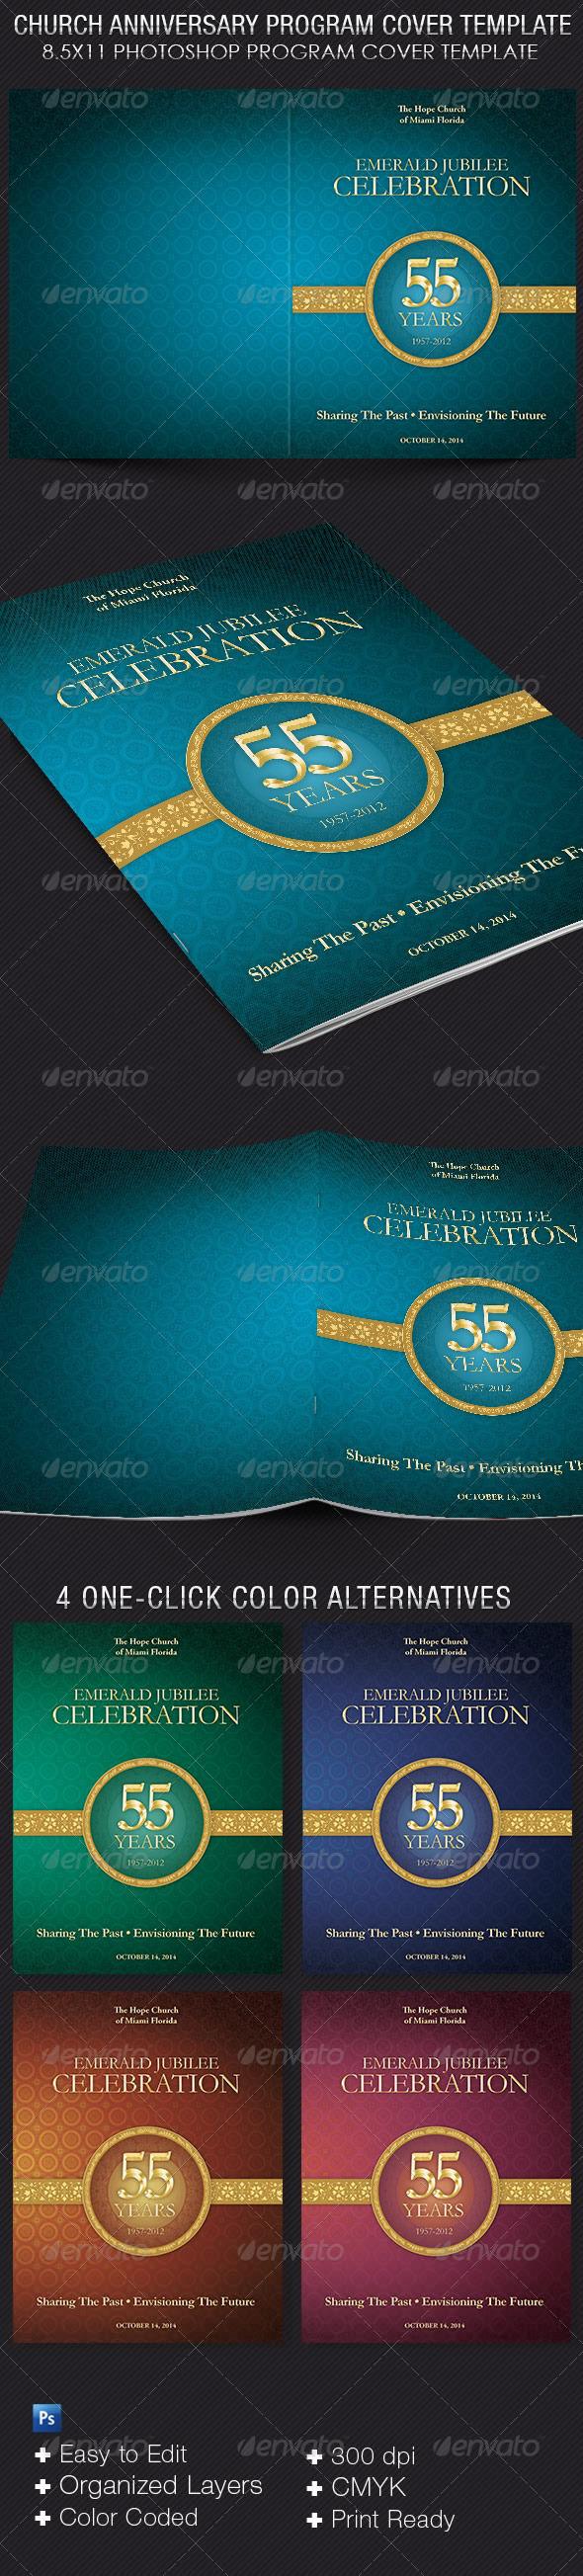 church anniversary program cover template on behance